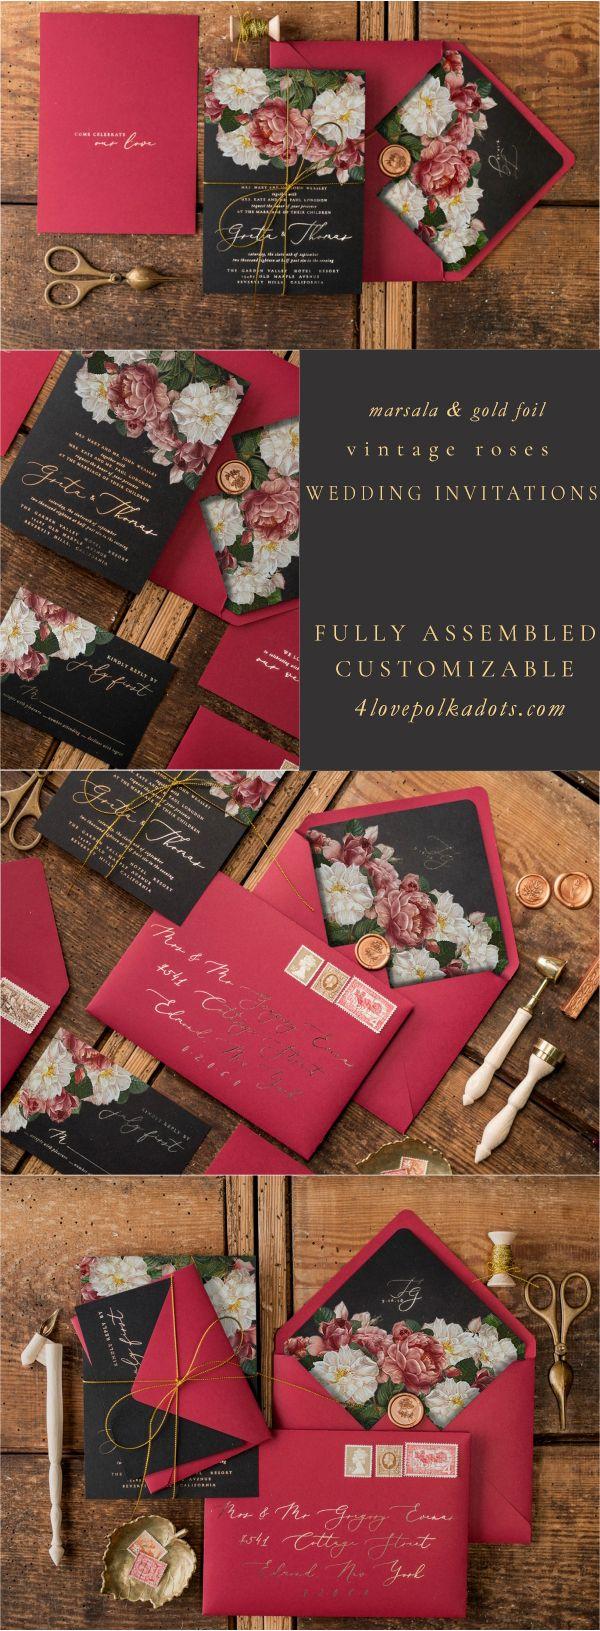 WEDDING INVITATIONS glitter | Addressing envelopes, Vintage roses ...